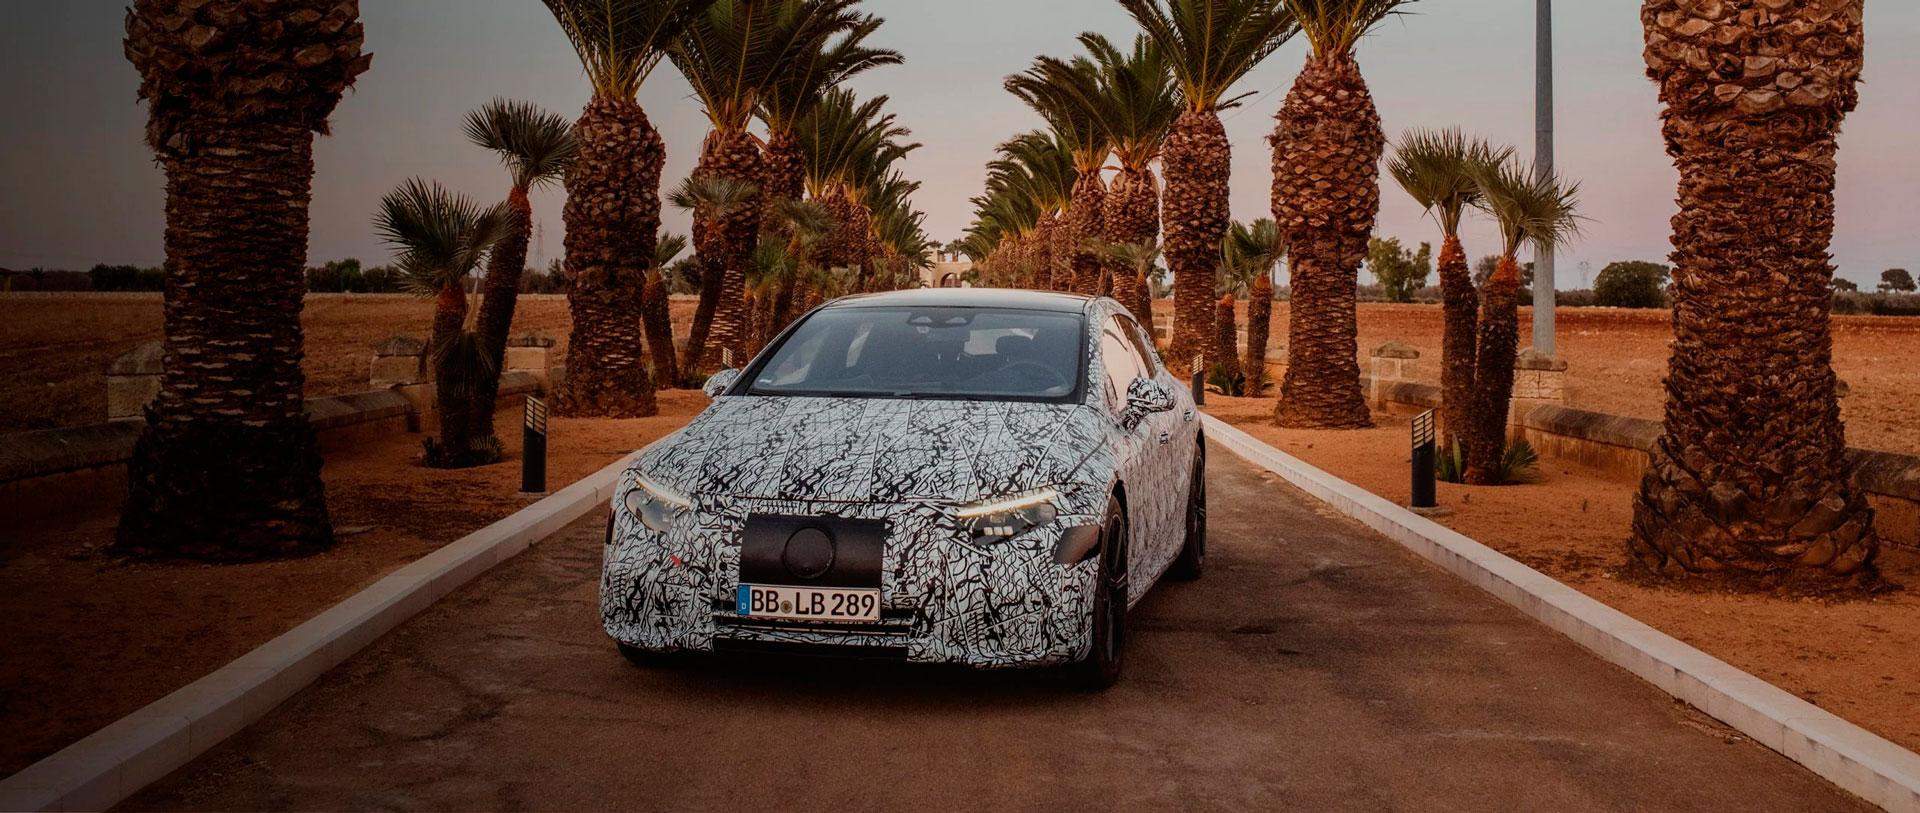 Mercedes-Benz EQS - нова ера електромобільності